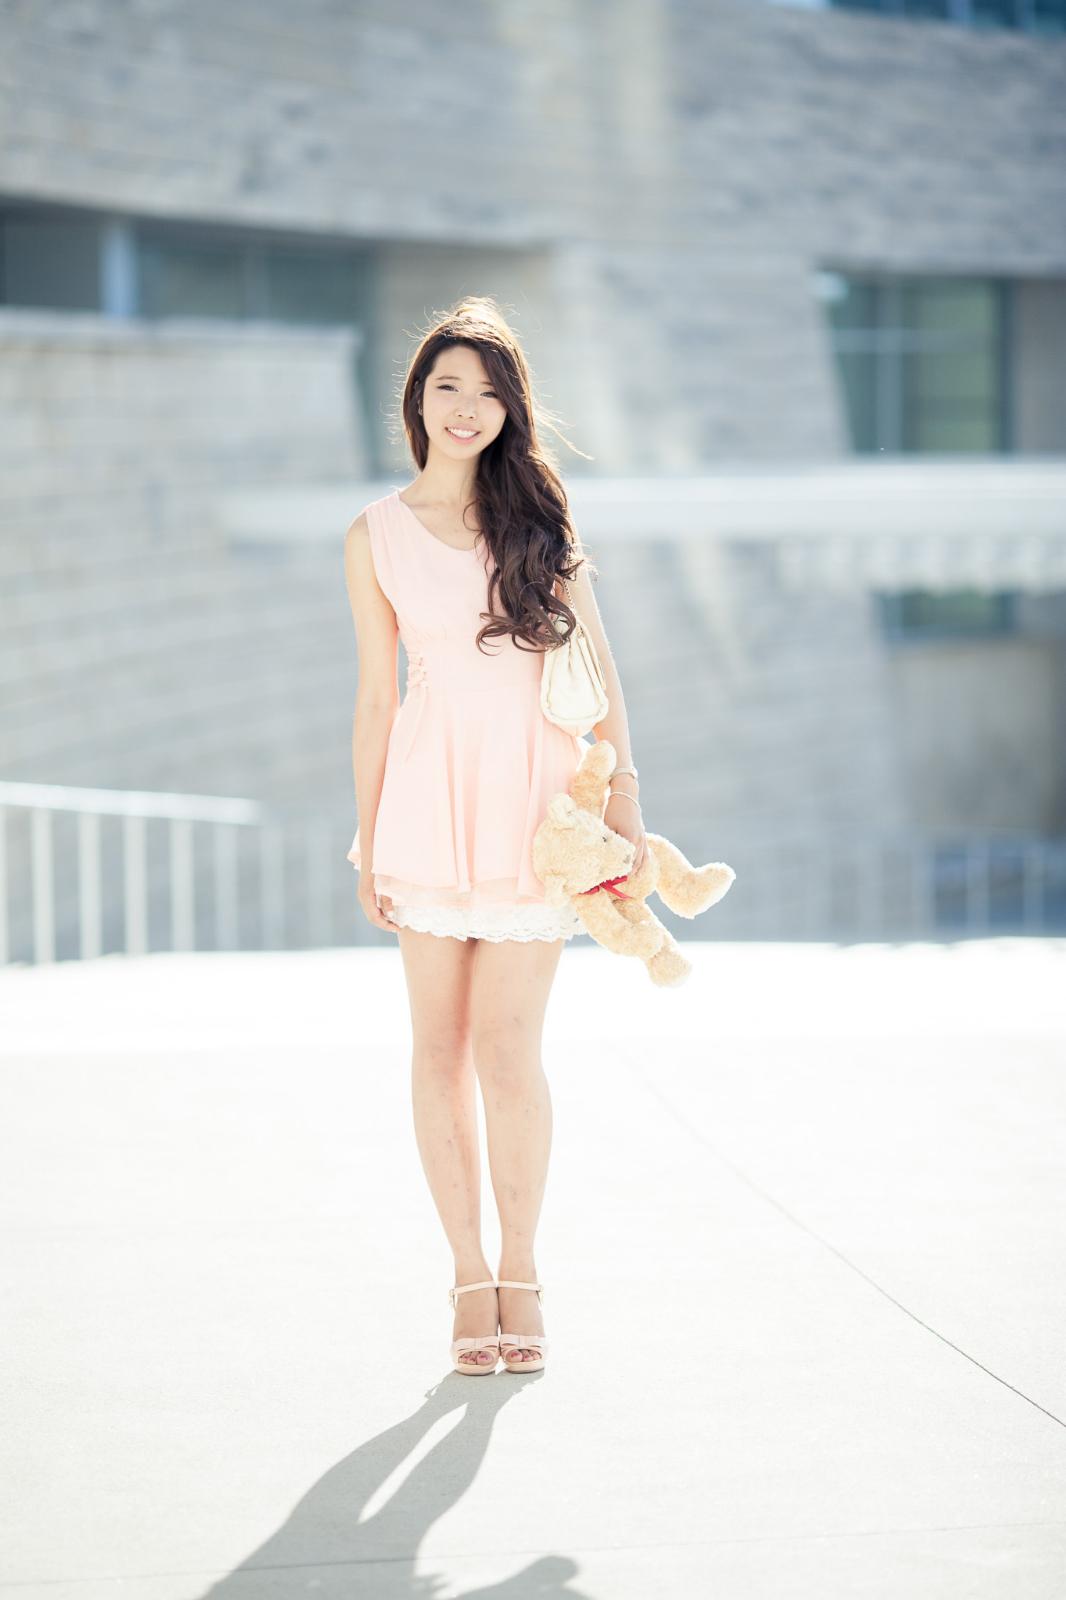 Girl walking in heels on rail track - 5 4